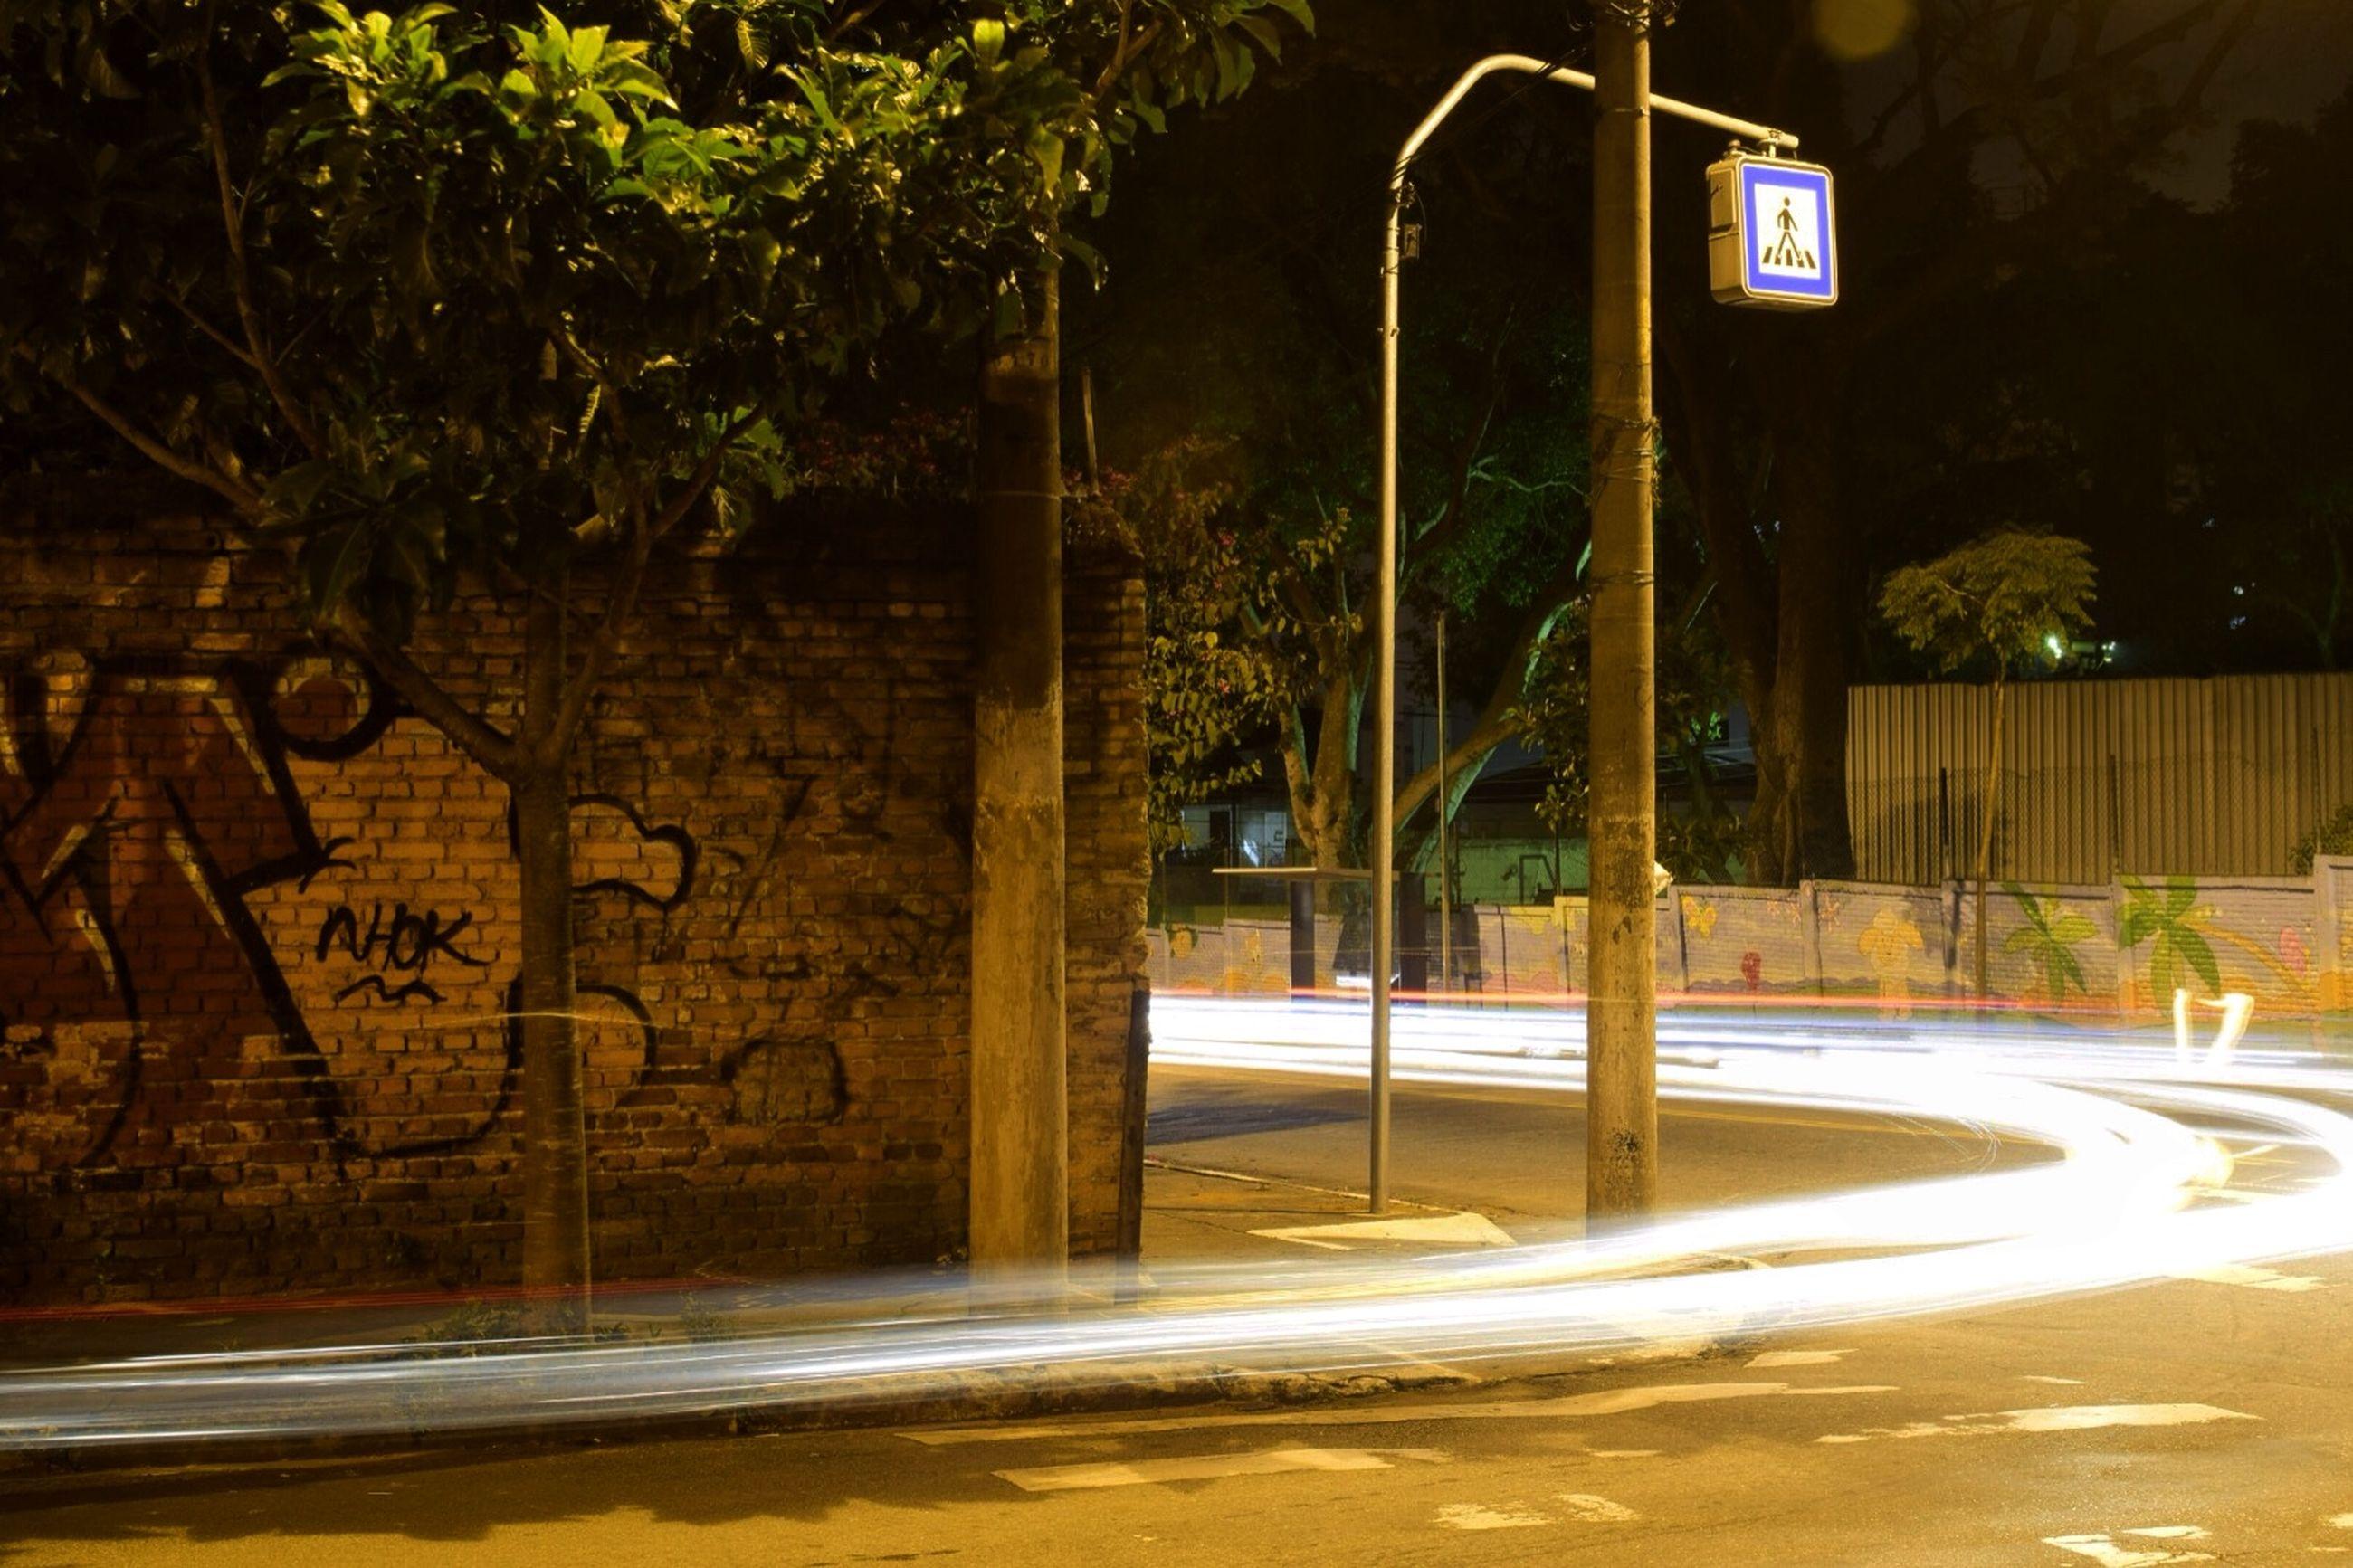 text, communication, western script, street, information sign, road sign, sign, guidance, road, street light, arrow symbol, built structure, tree, information, night, transportation, illuminated, building exterior, architecture, directional sign